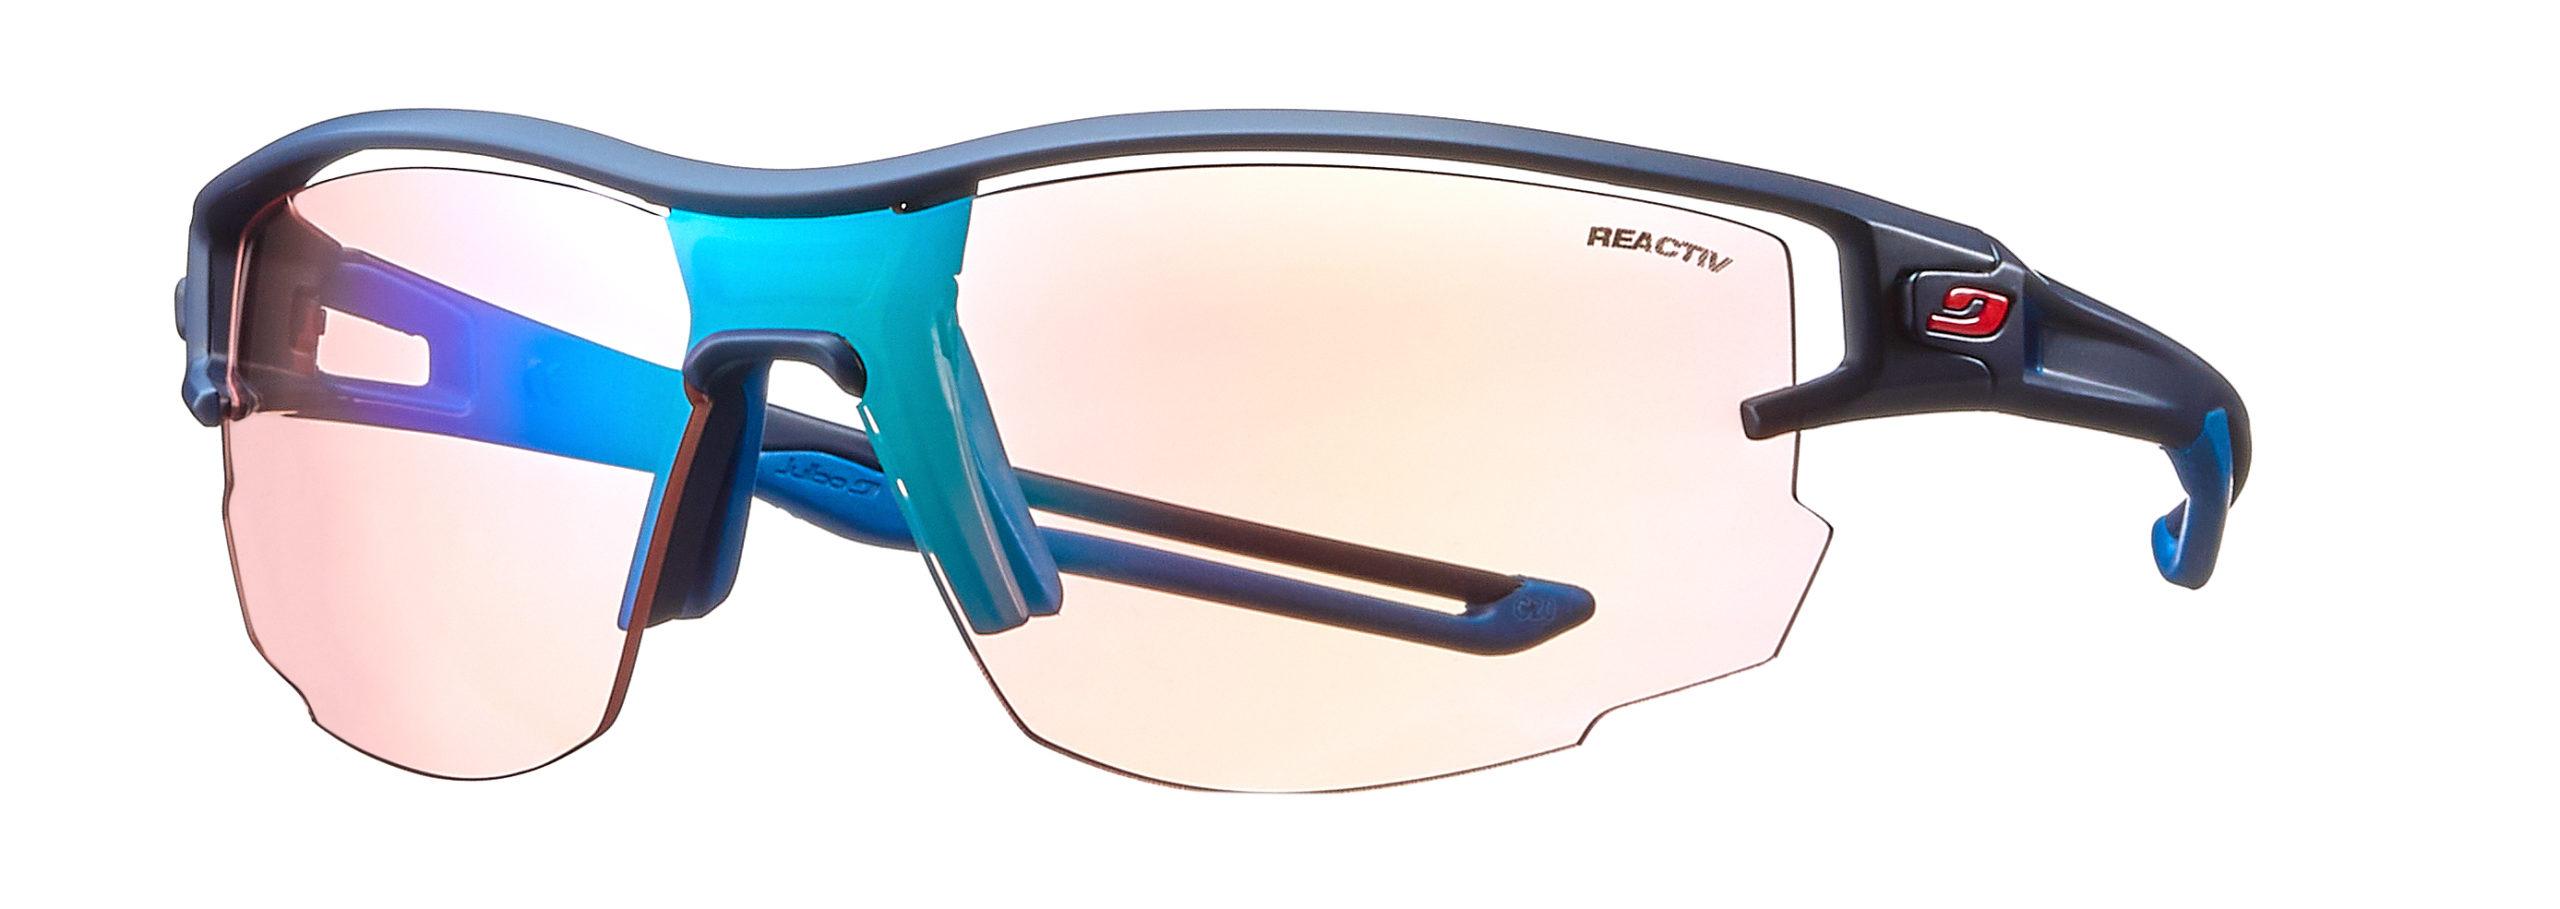 Aero - dunkelblau